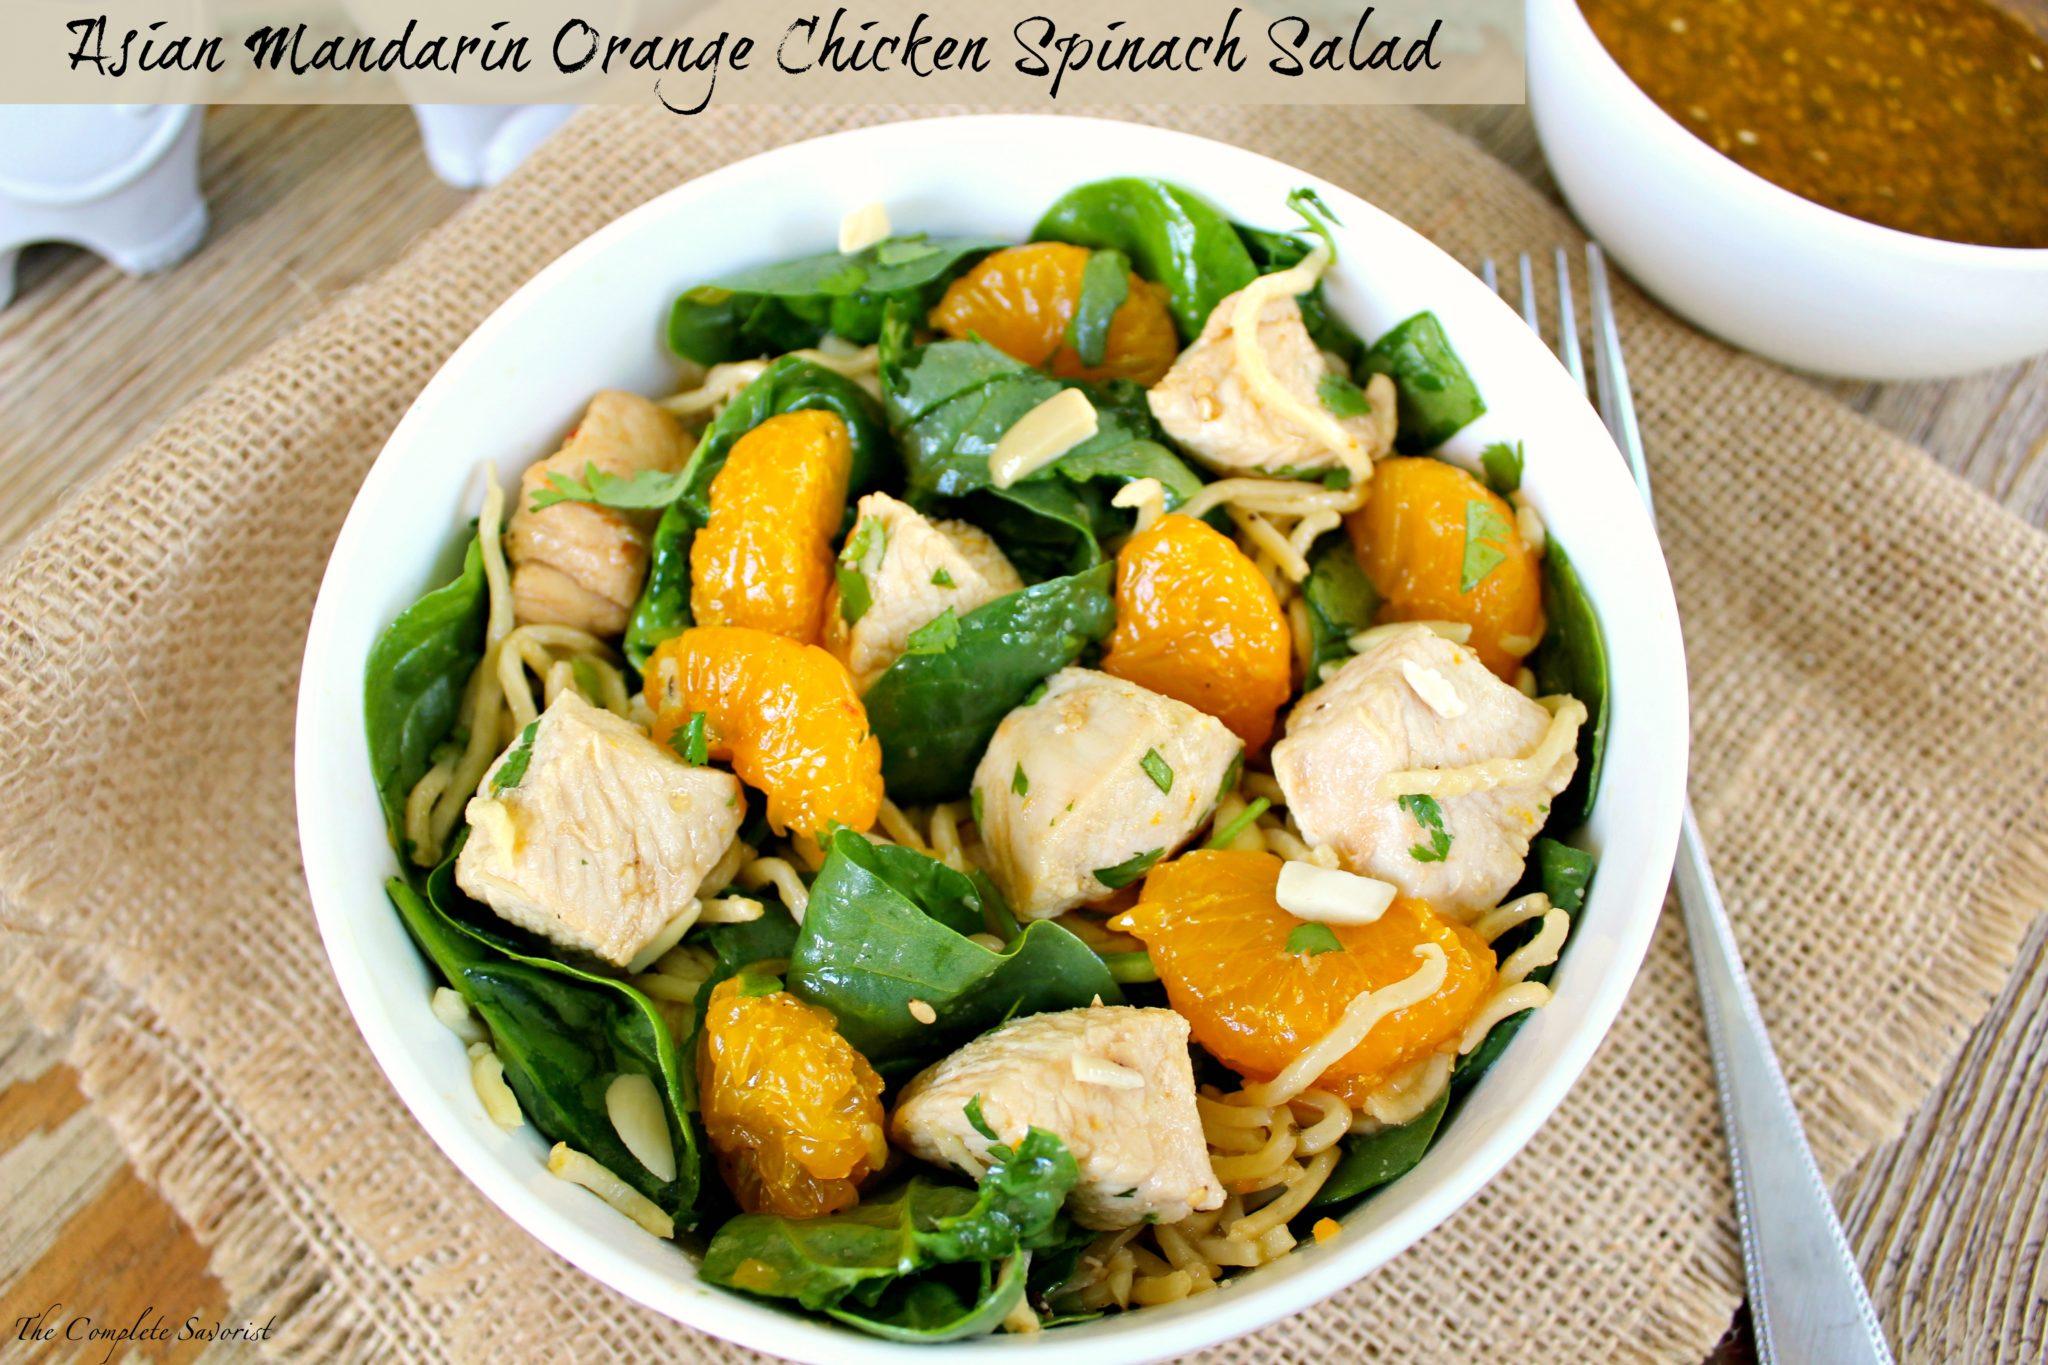 Woooo asian mandarin orange salad recipes